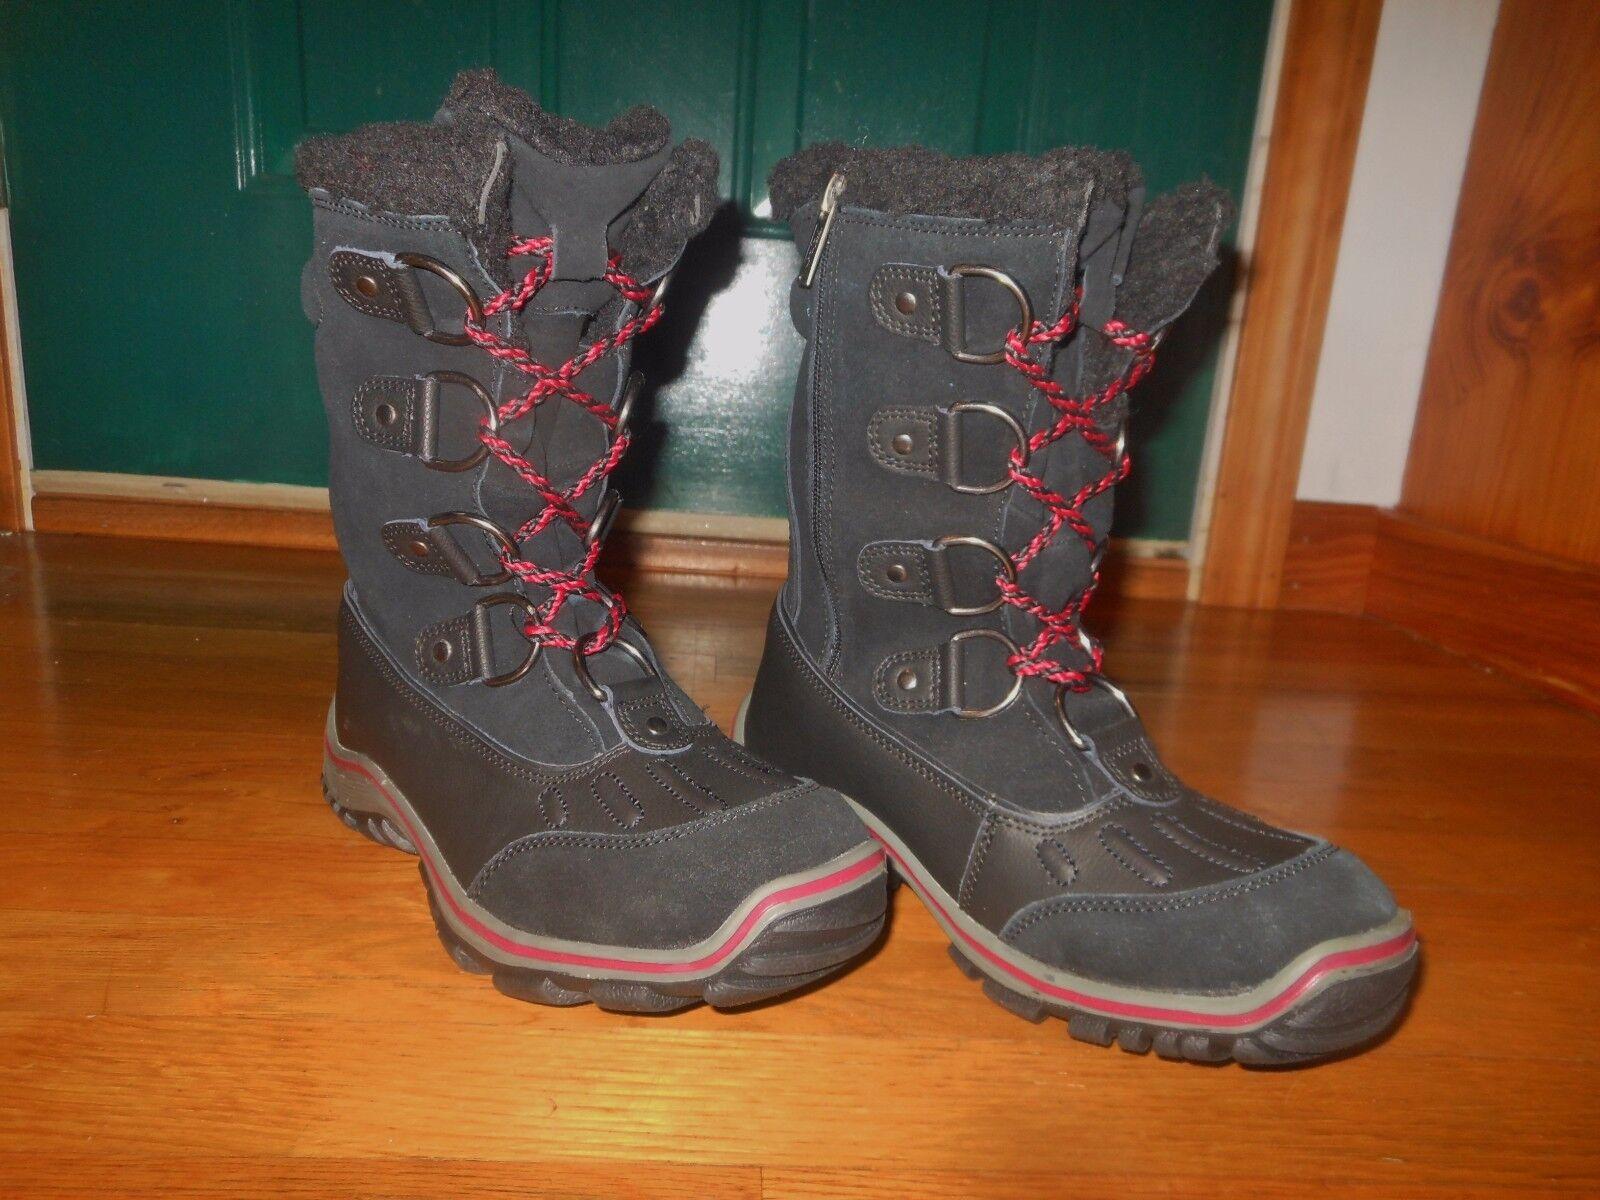 Pajar Alina women's winter boots - Sz Sz Sz 9-9.5 M - Euro sz 40 - Black - Worn once a75a07